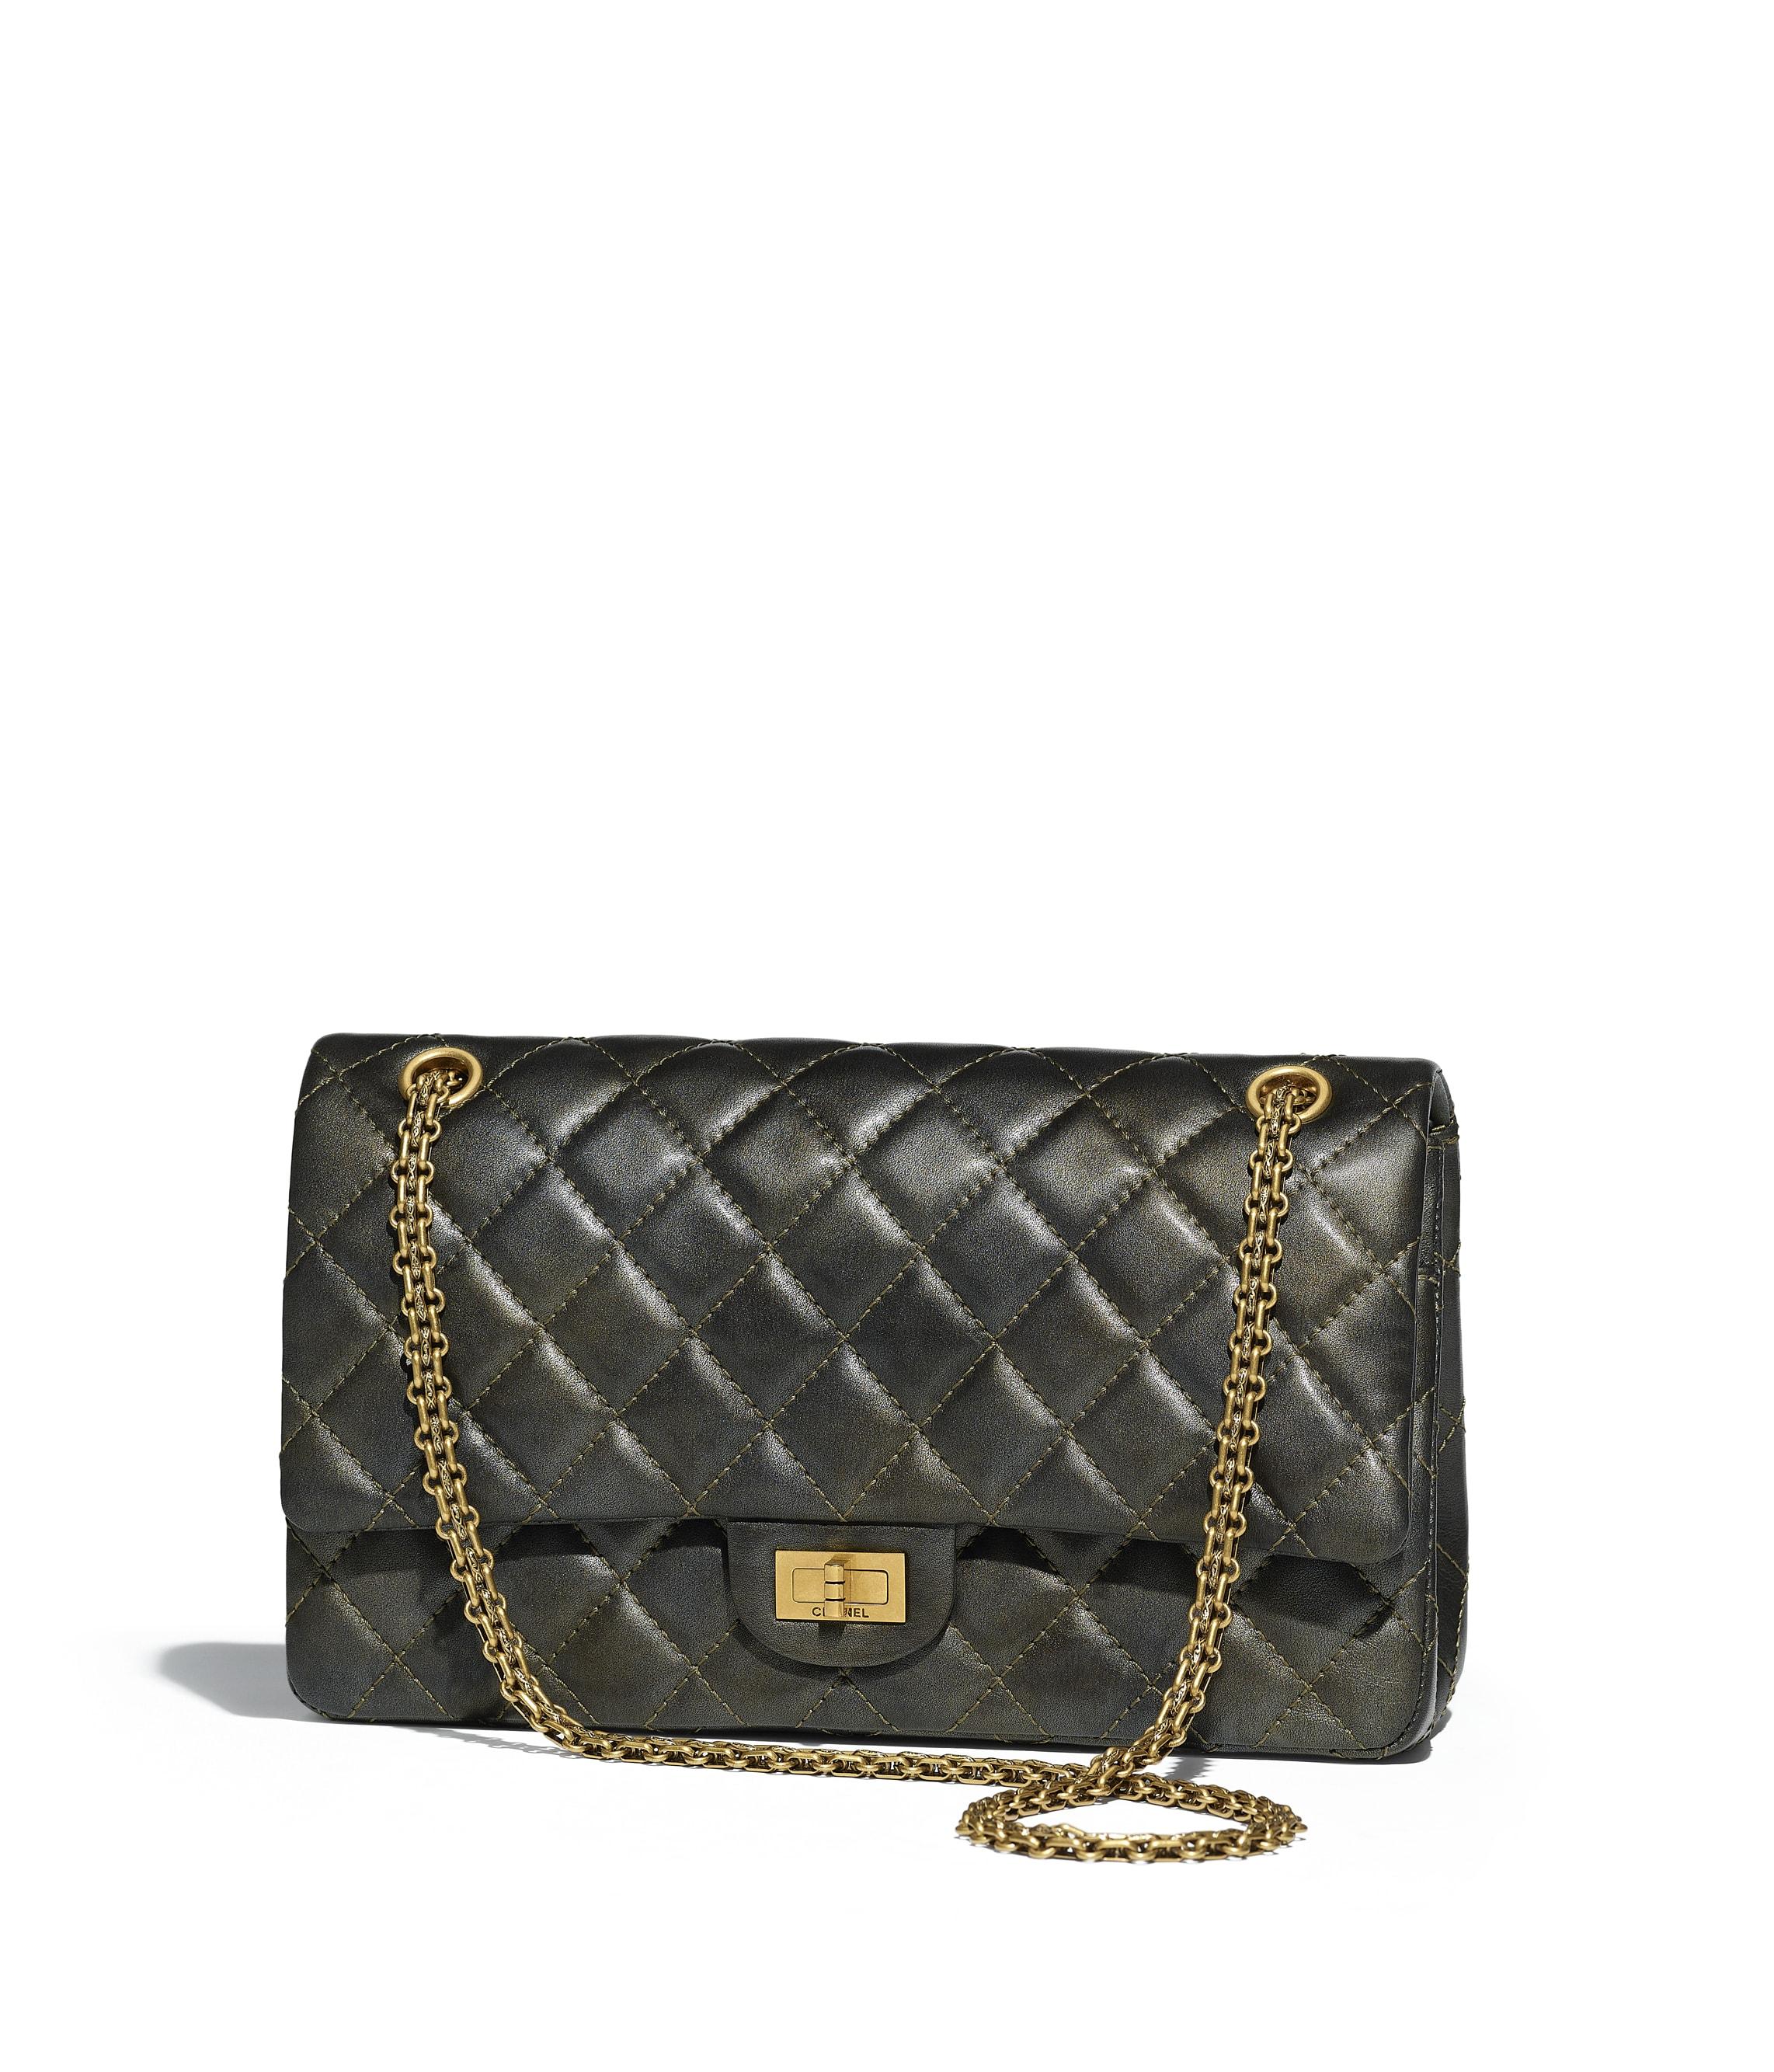 handbags handbags chanel. Black Bedroom Furniture Sets. Home Design Ideas